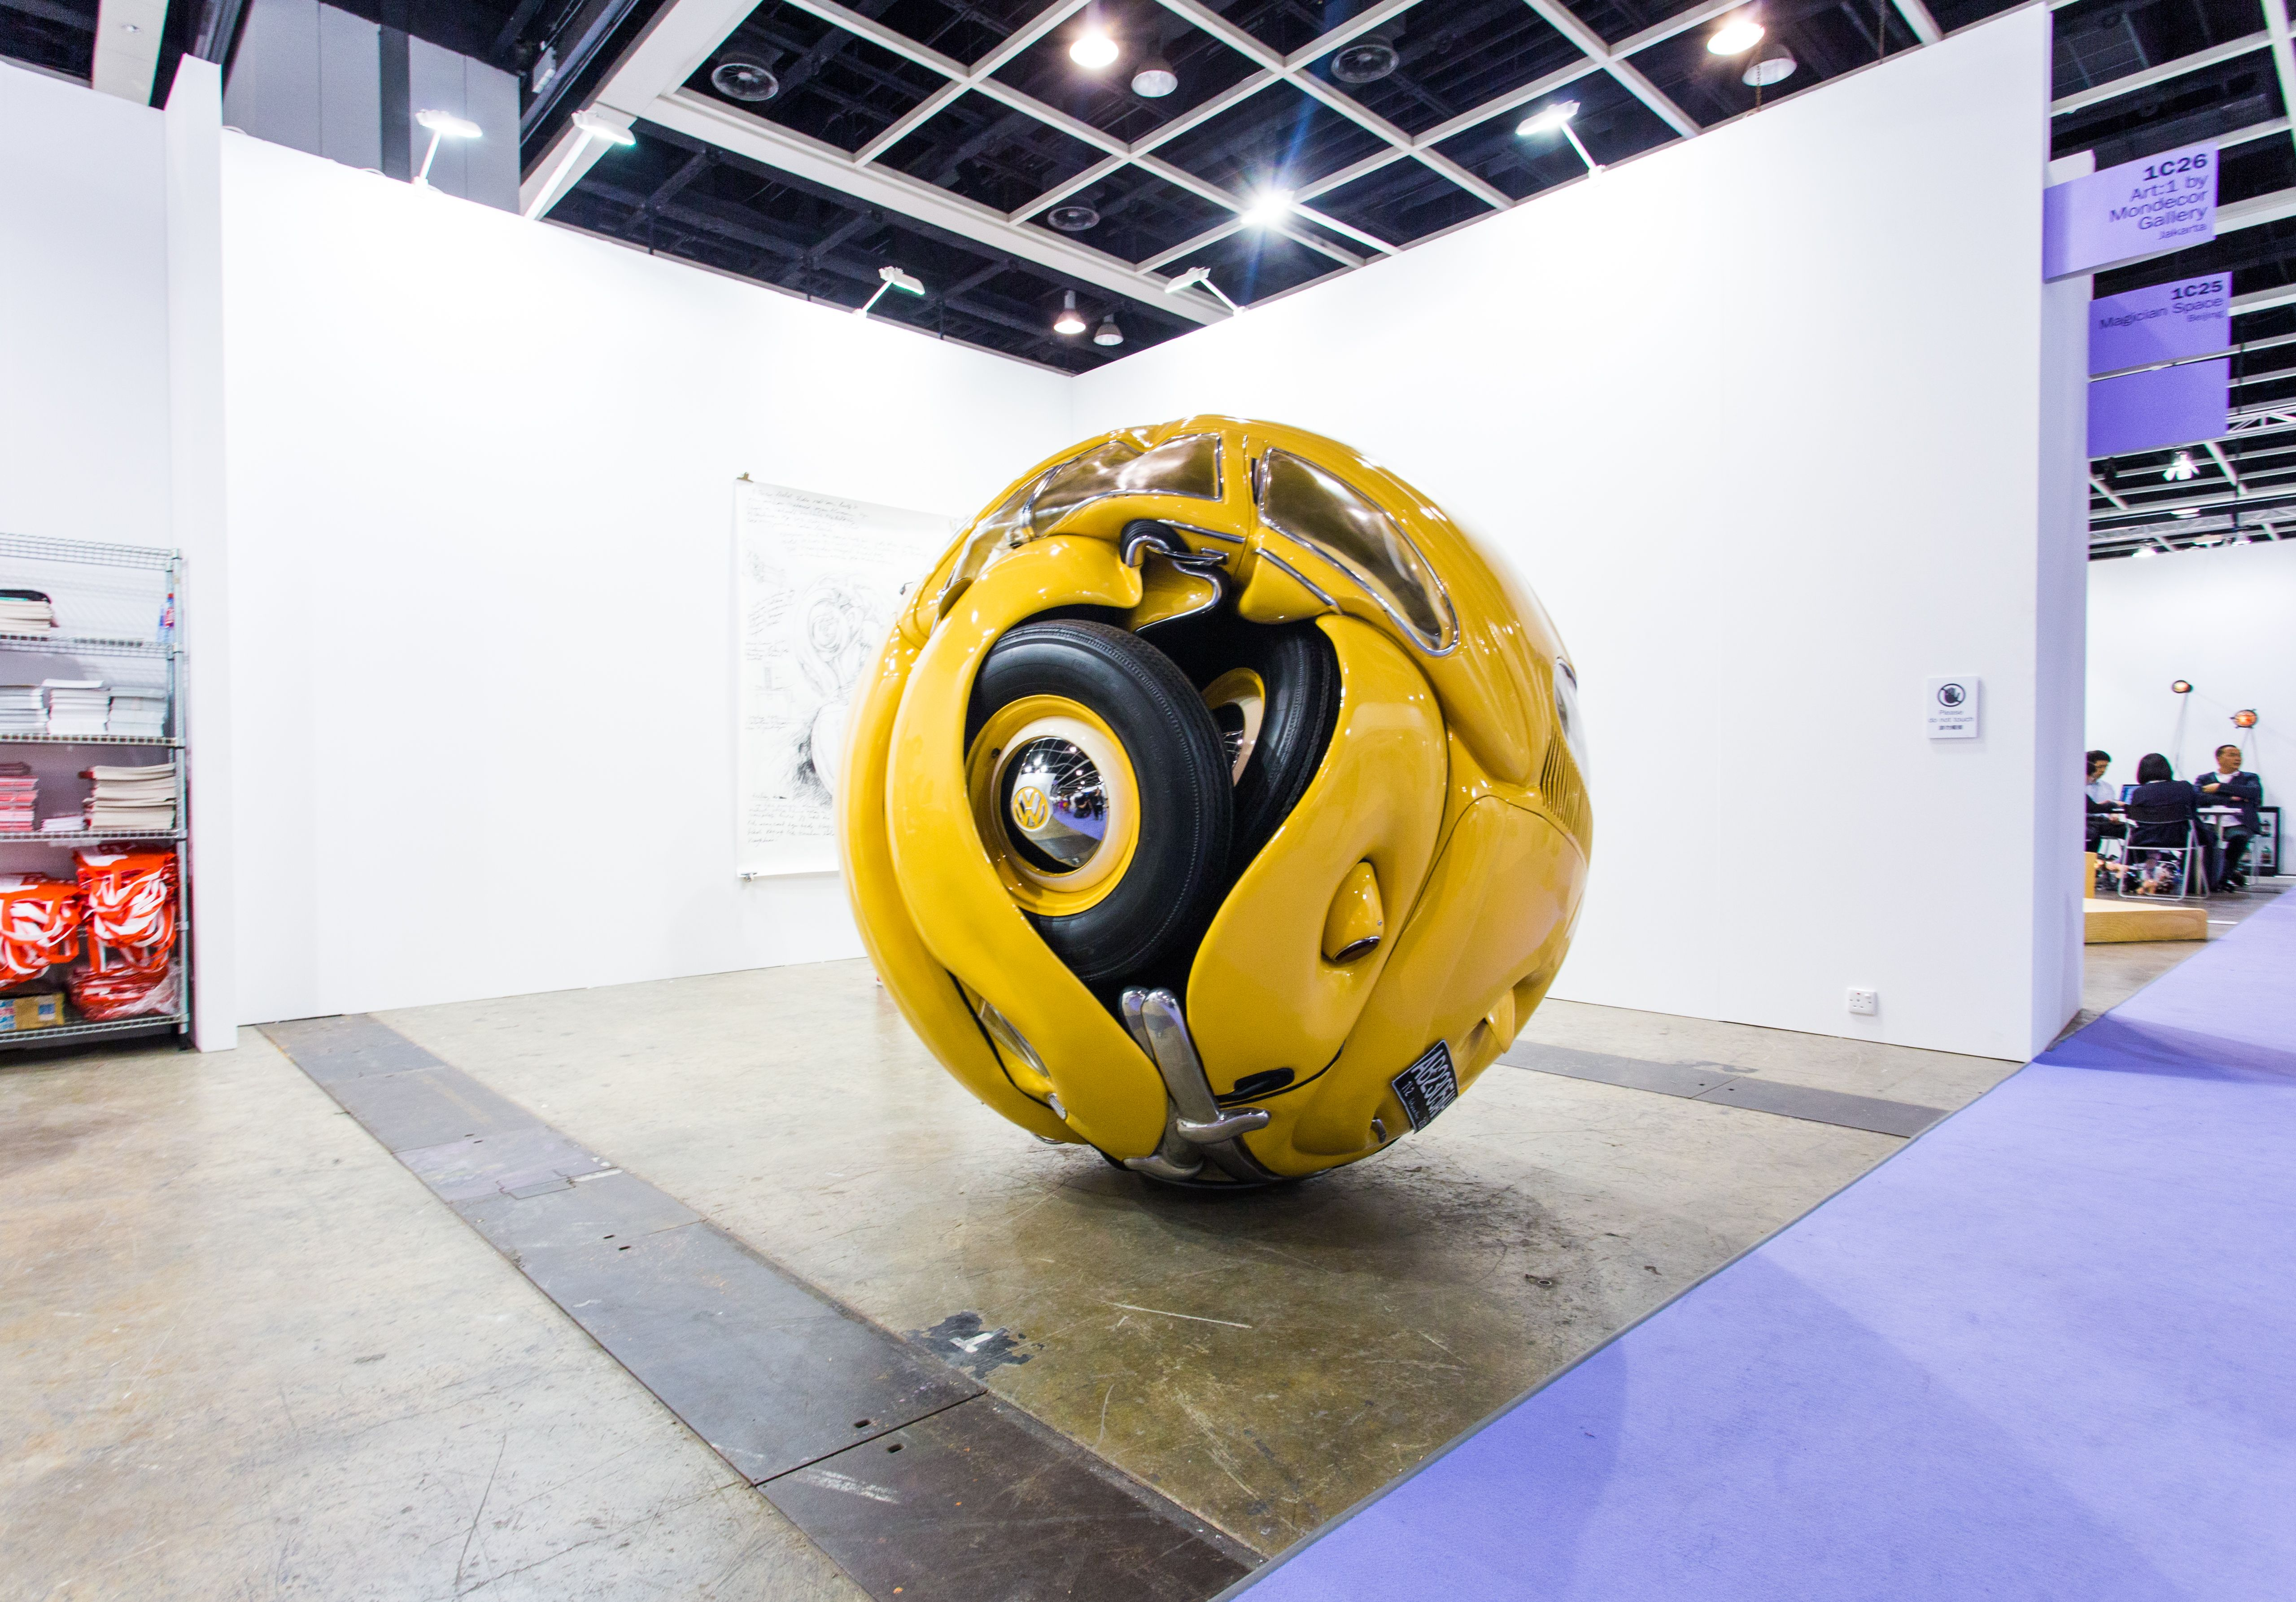 """Ichwan Noor (b. 1963): Beetle Sphere, 2013 (Aluminium, polyester, real parts from VW beetle '53, paint)"" / Art:1 by Mondecor Gallery / Art Basel Hong Kong 2013 / SML.20130523.6D.14135"